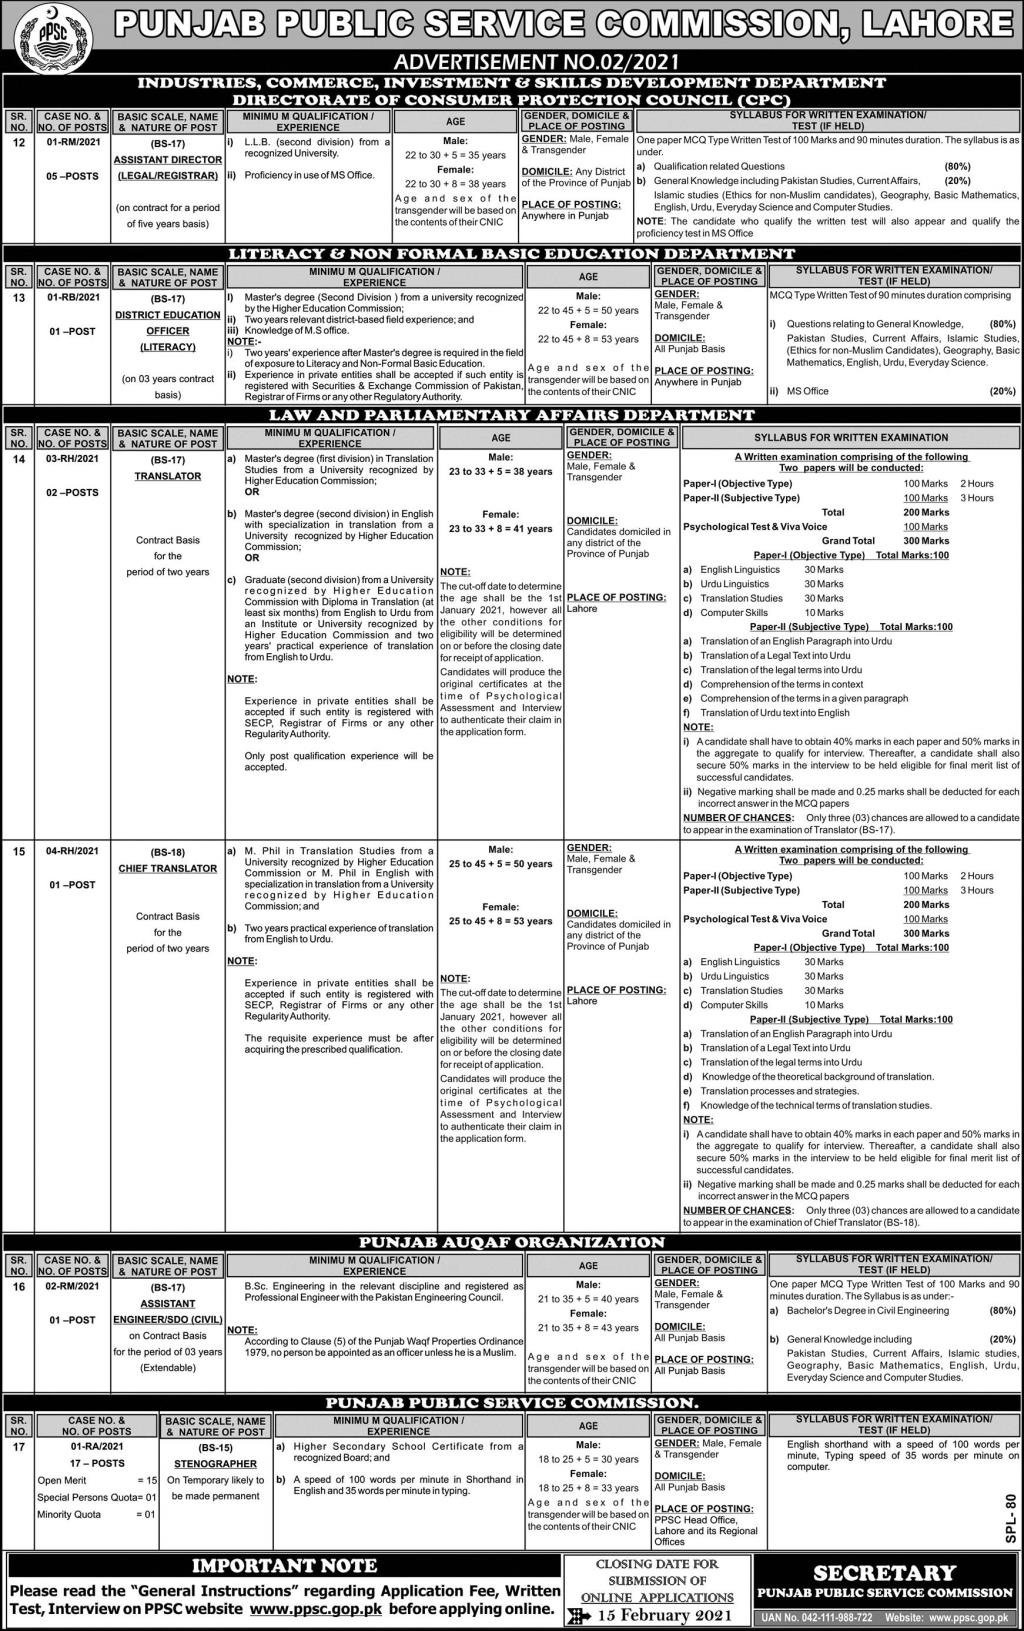 PPSC jobs 2021 Advertisement | Govt Jobs 2021 Pakistan - thejobs365.com